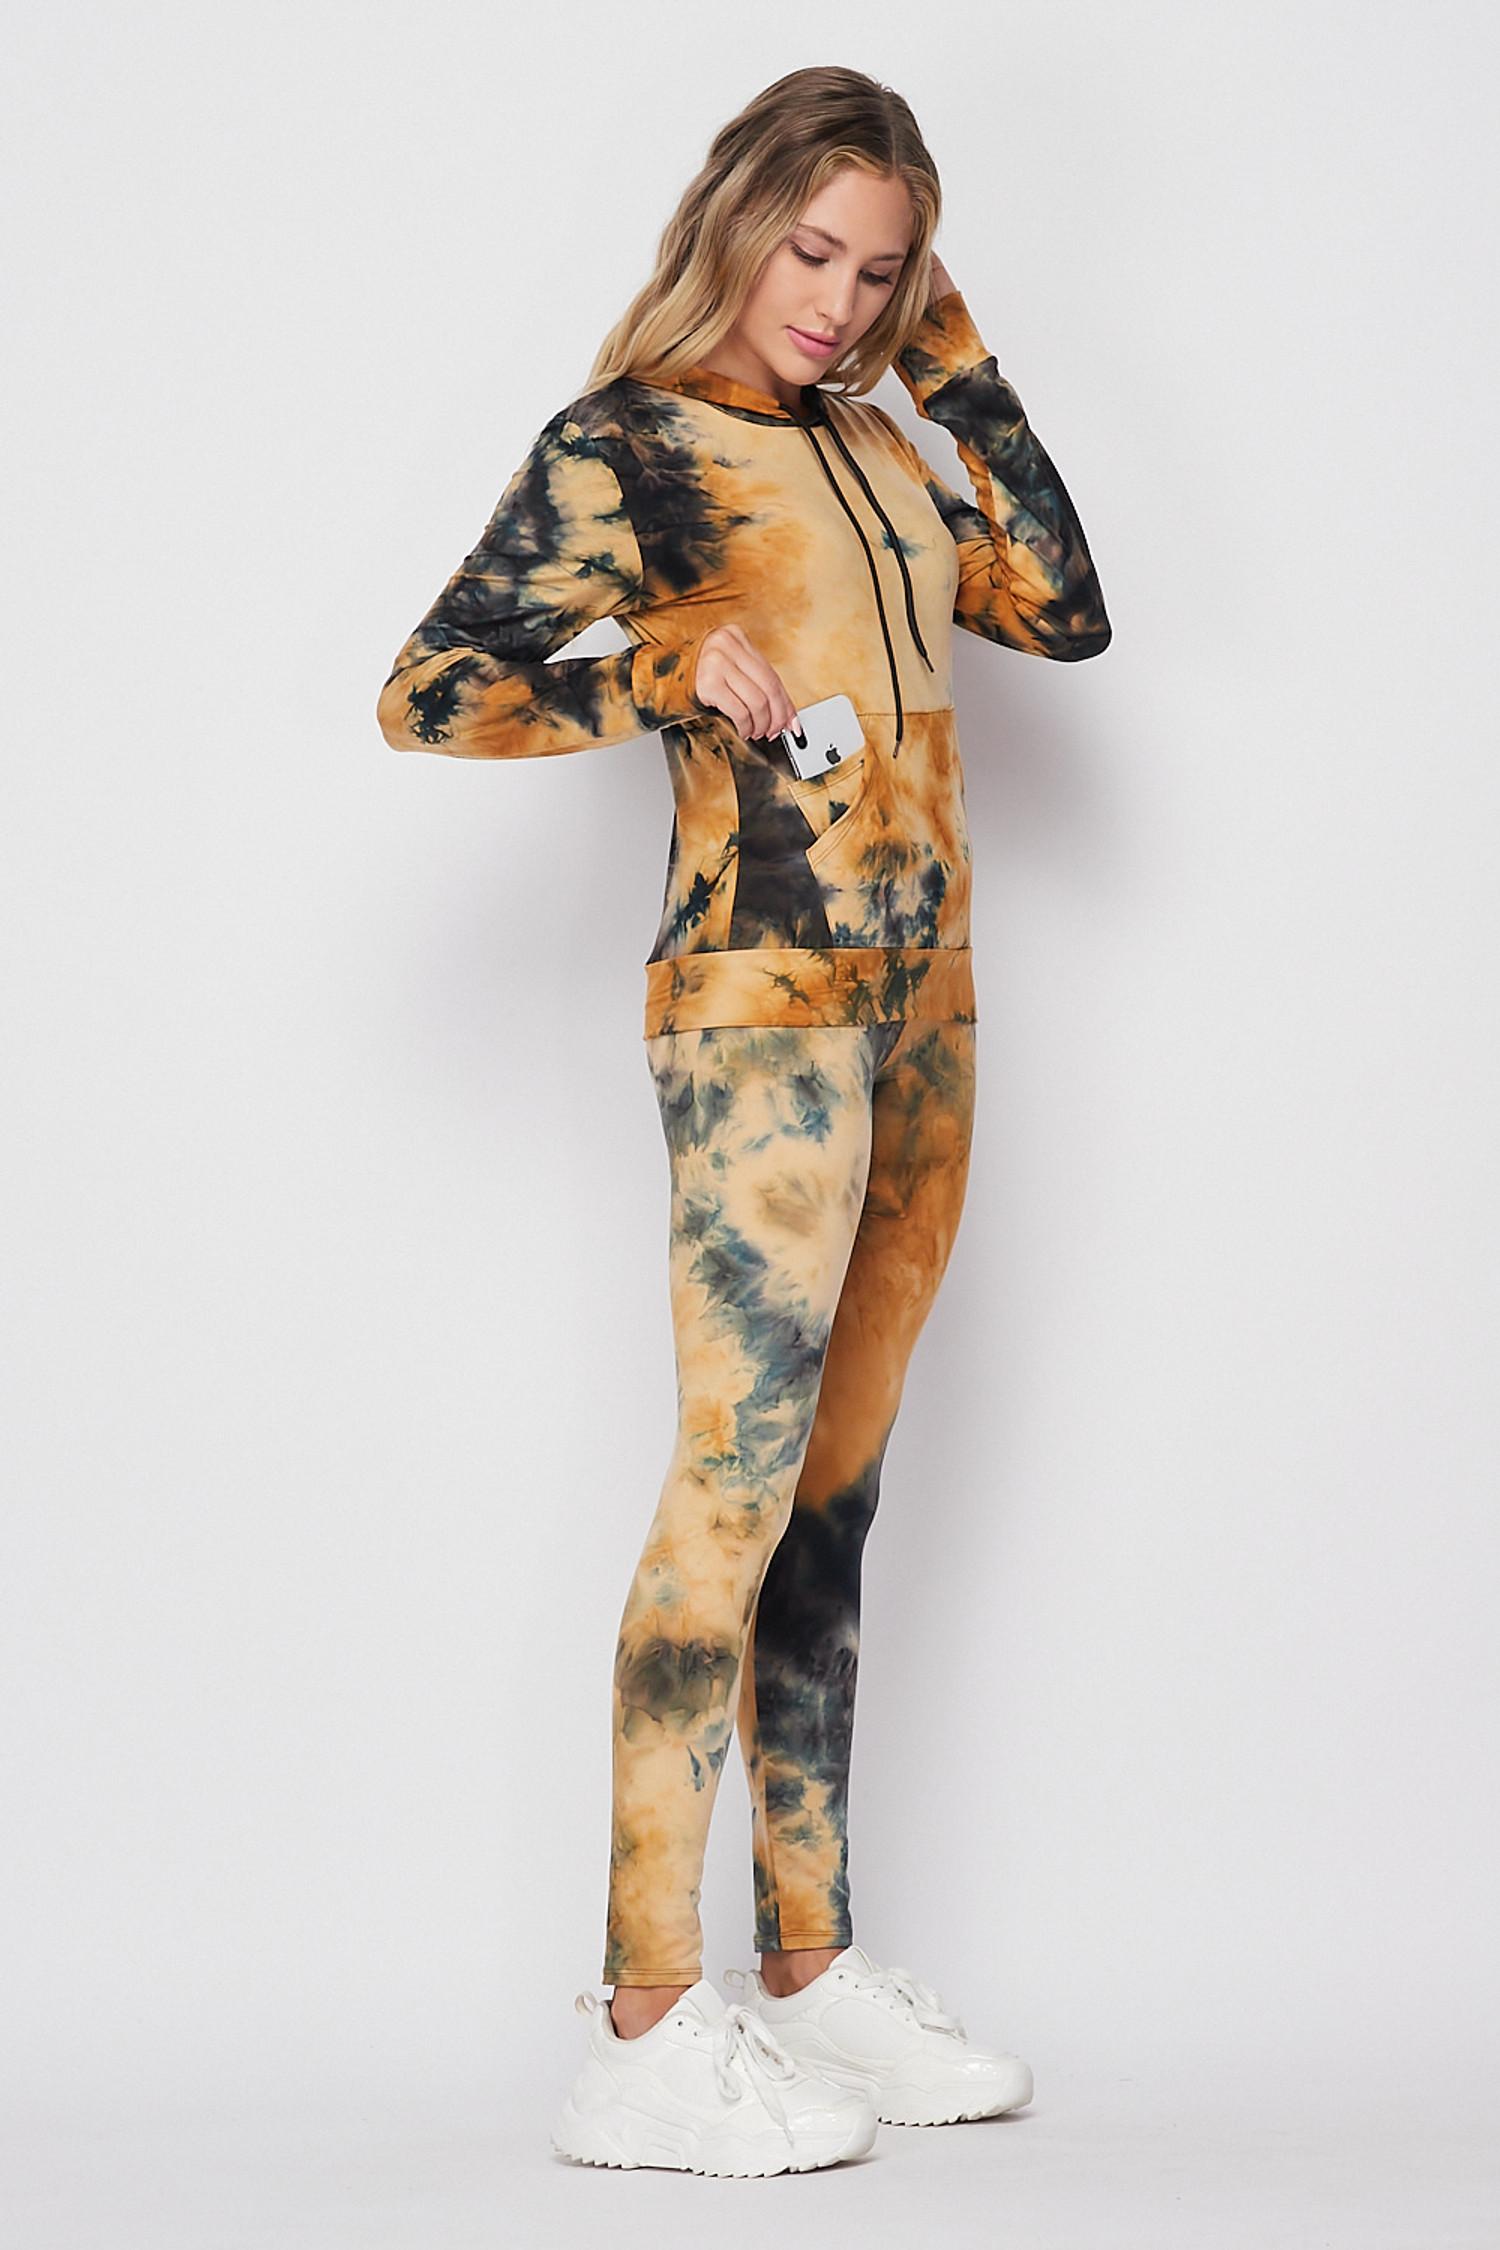 Camel Tie Dye 2 Piece Leggings and Hooded Jacket Set